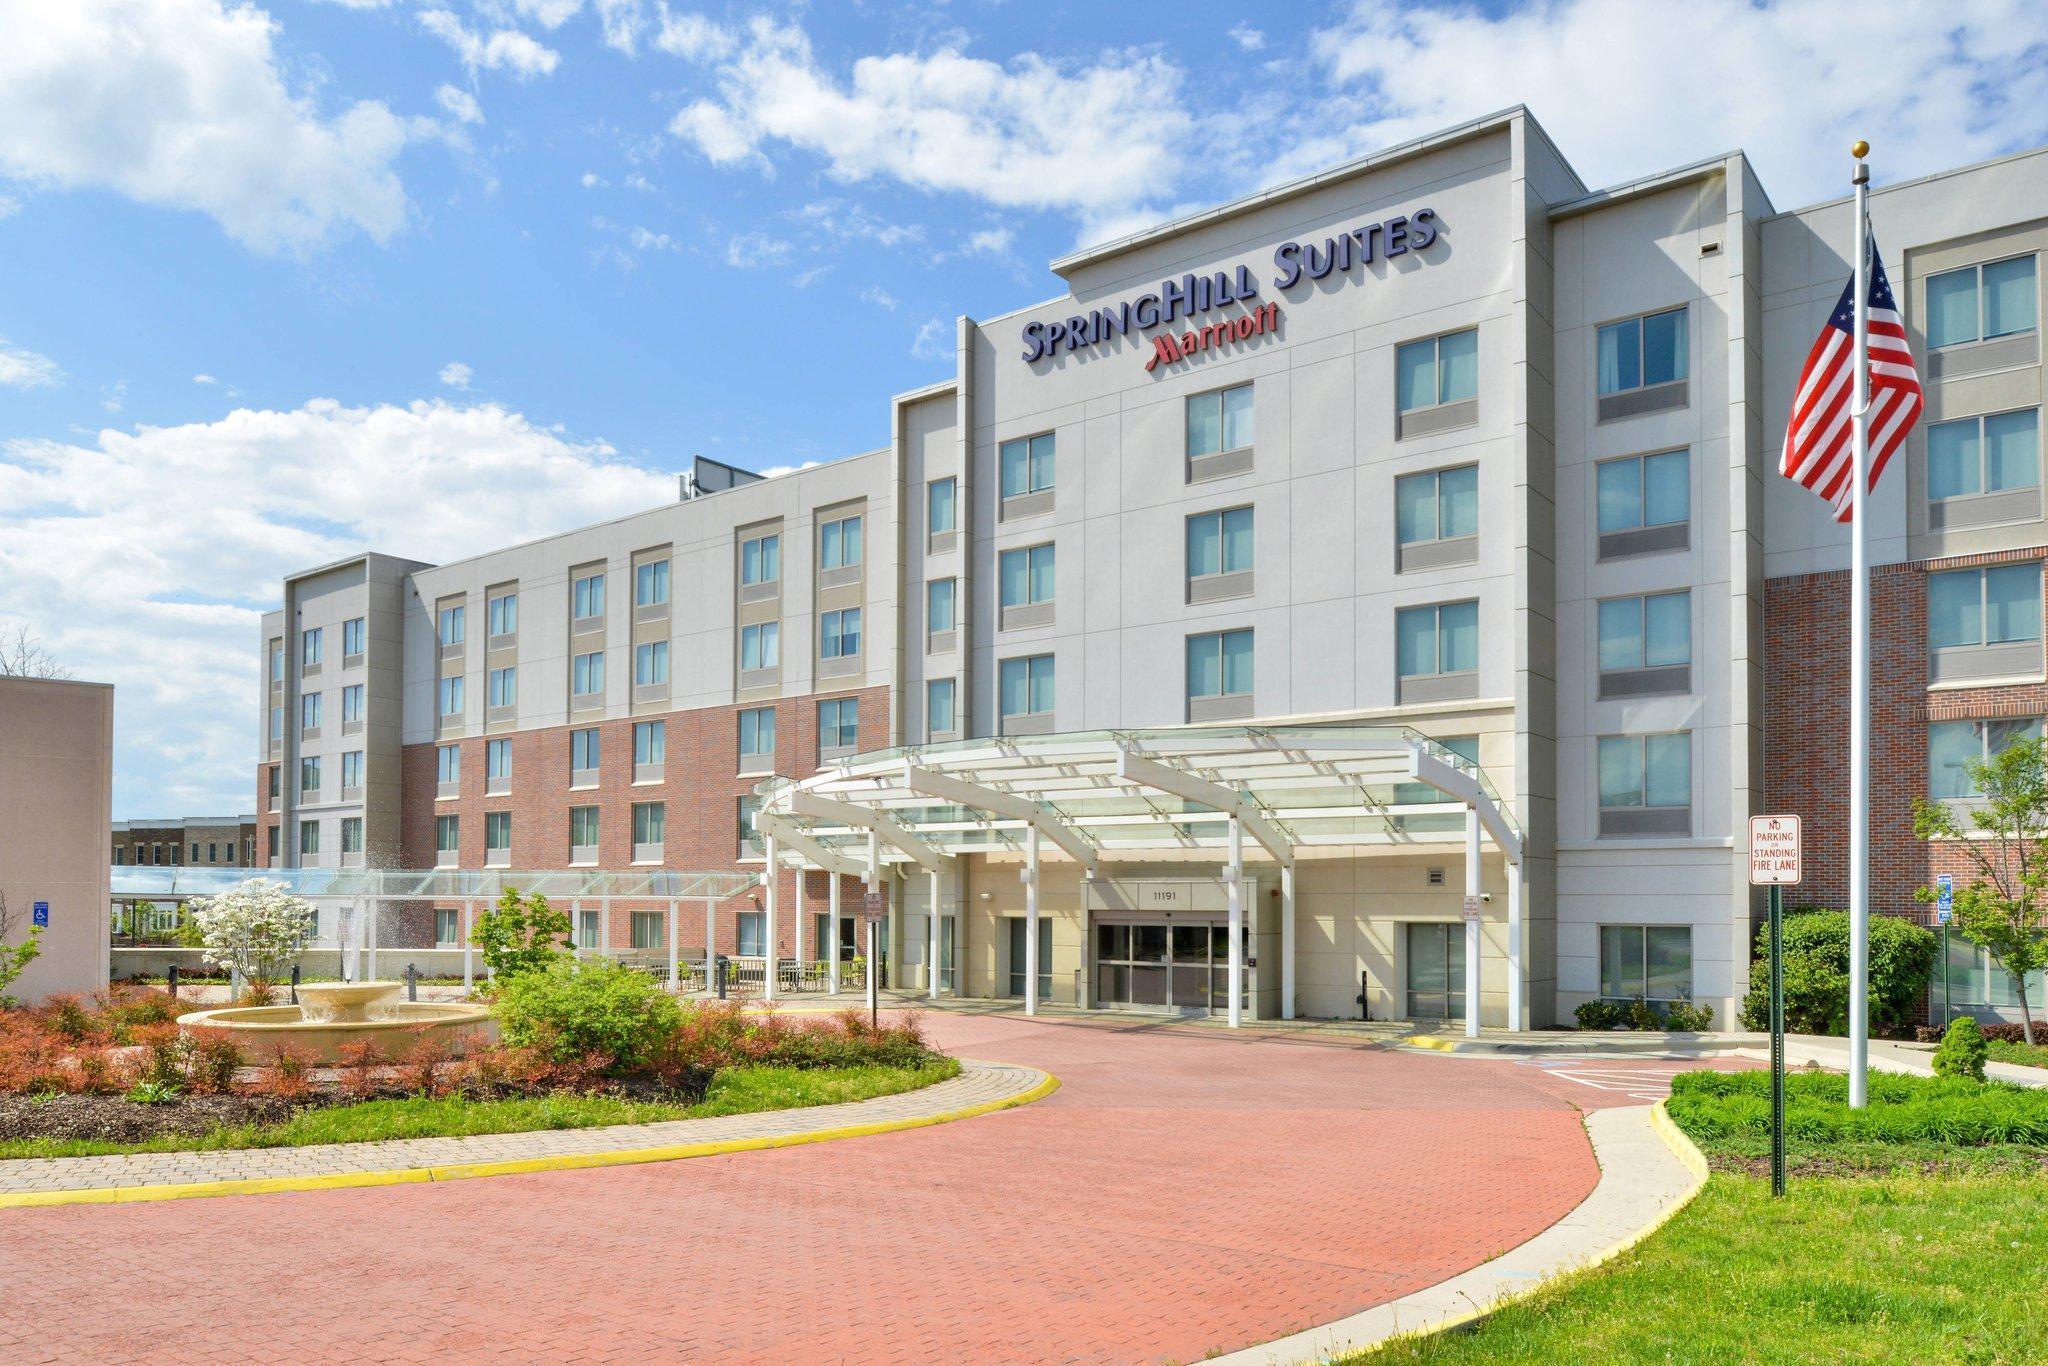 SpringHill Suites Fairfax Fair Oaks